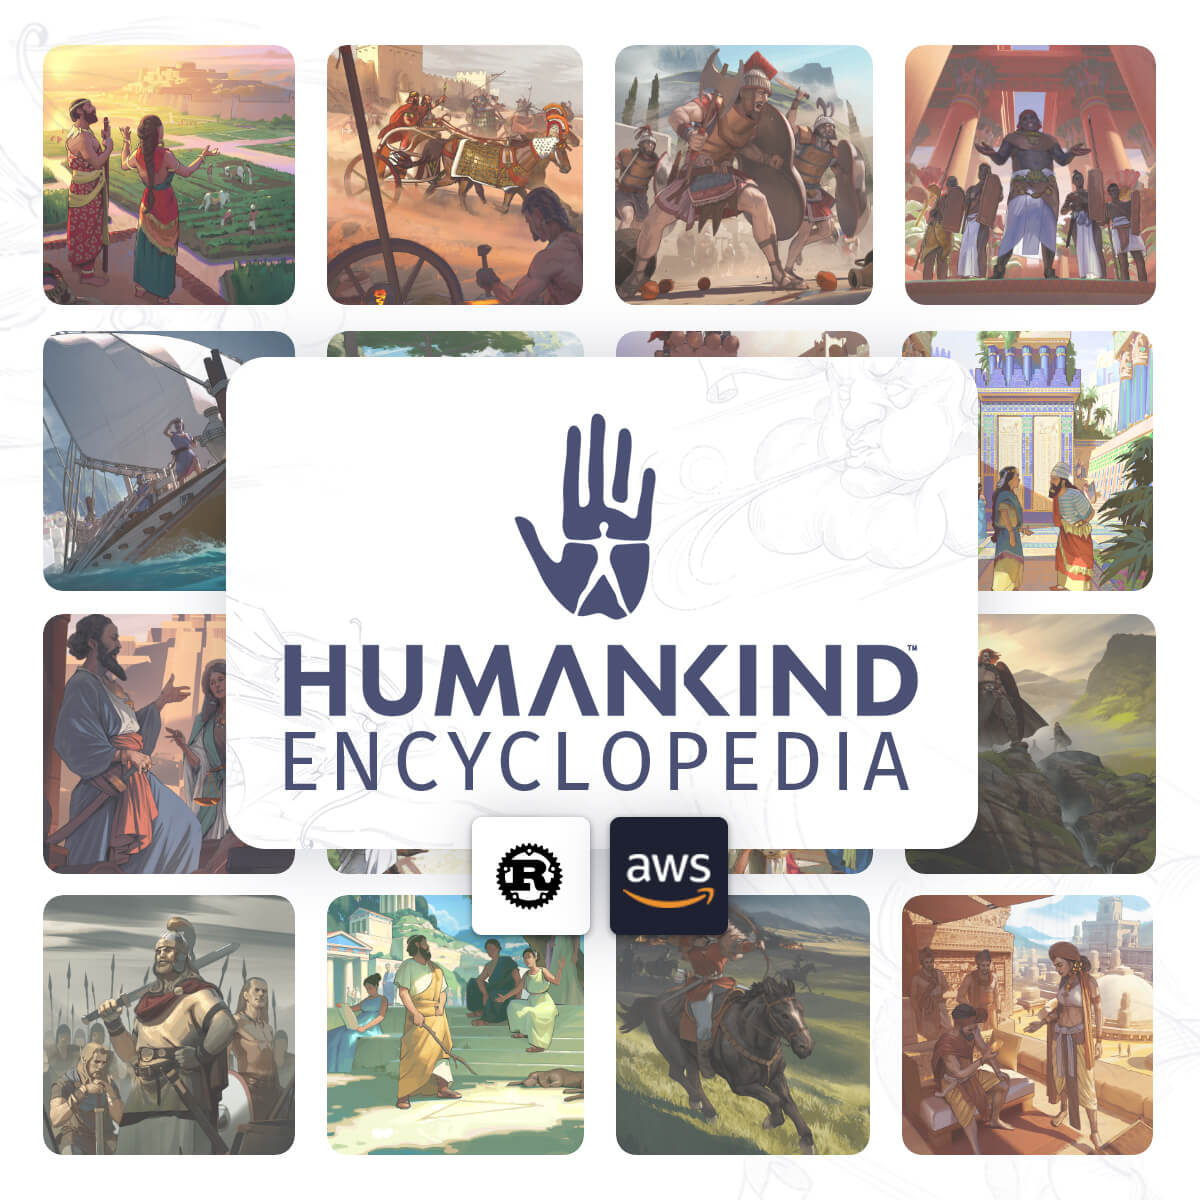 Humankind's logo